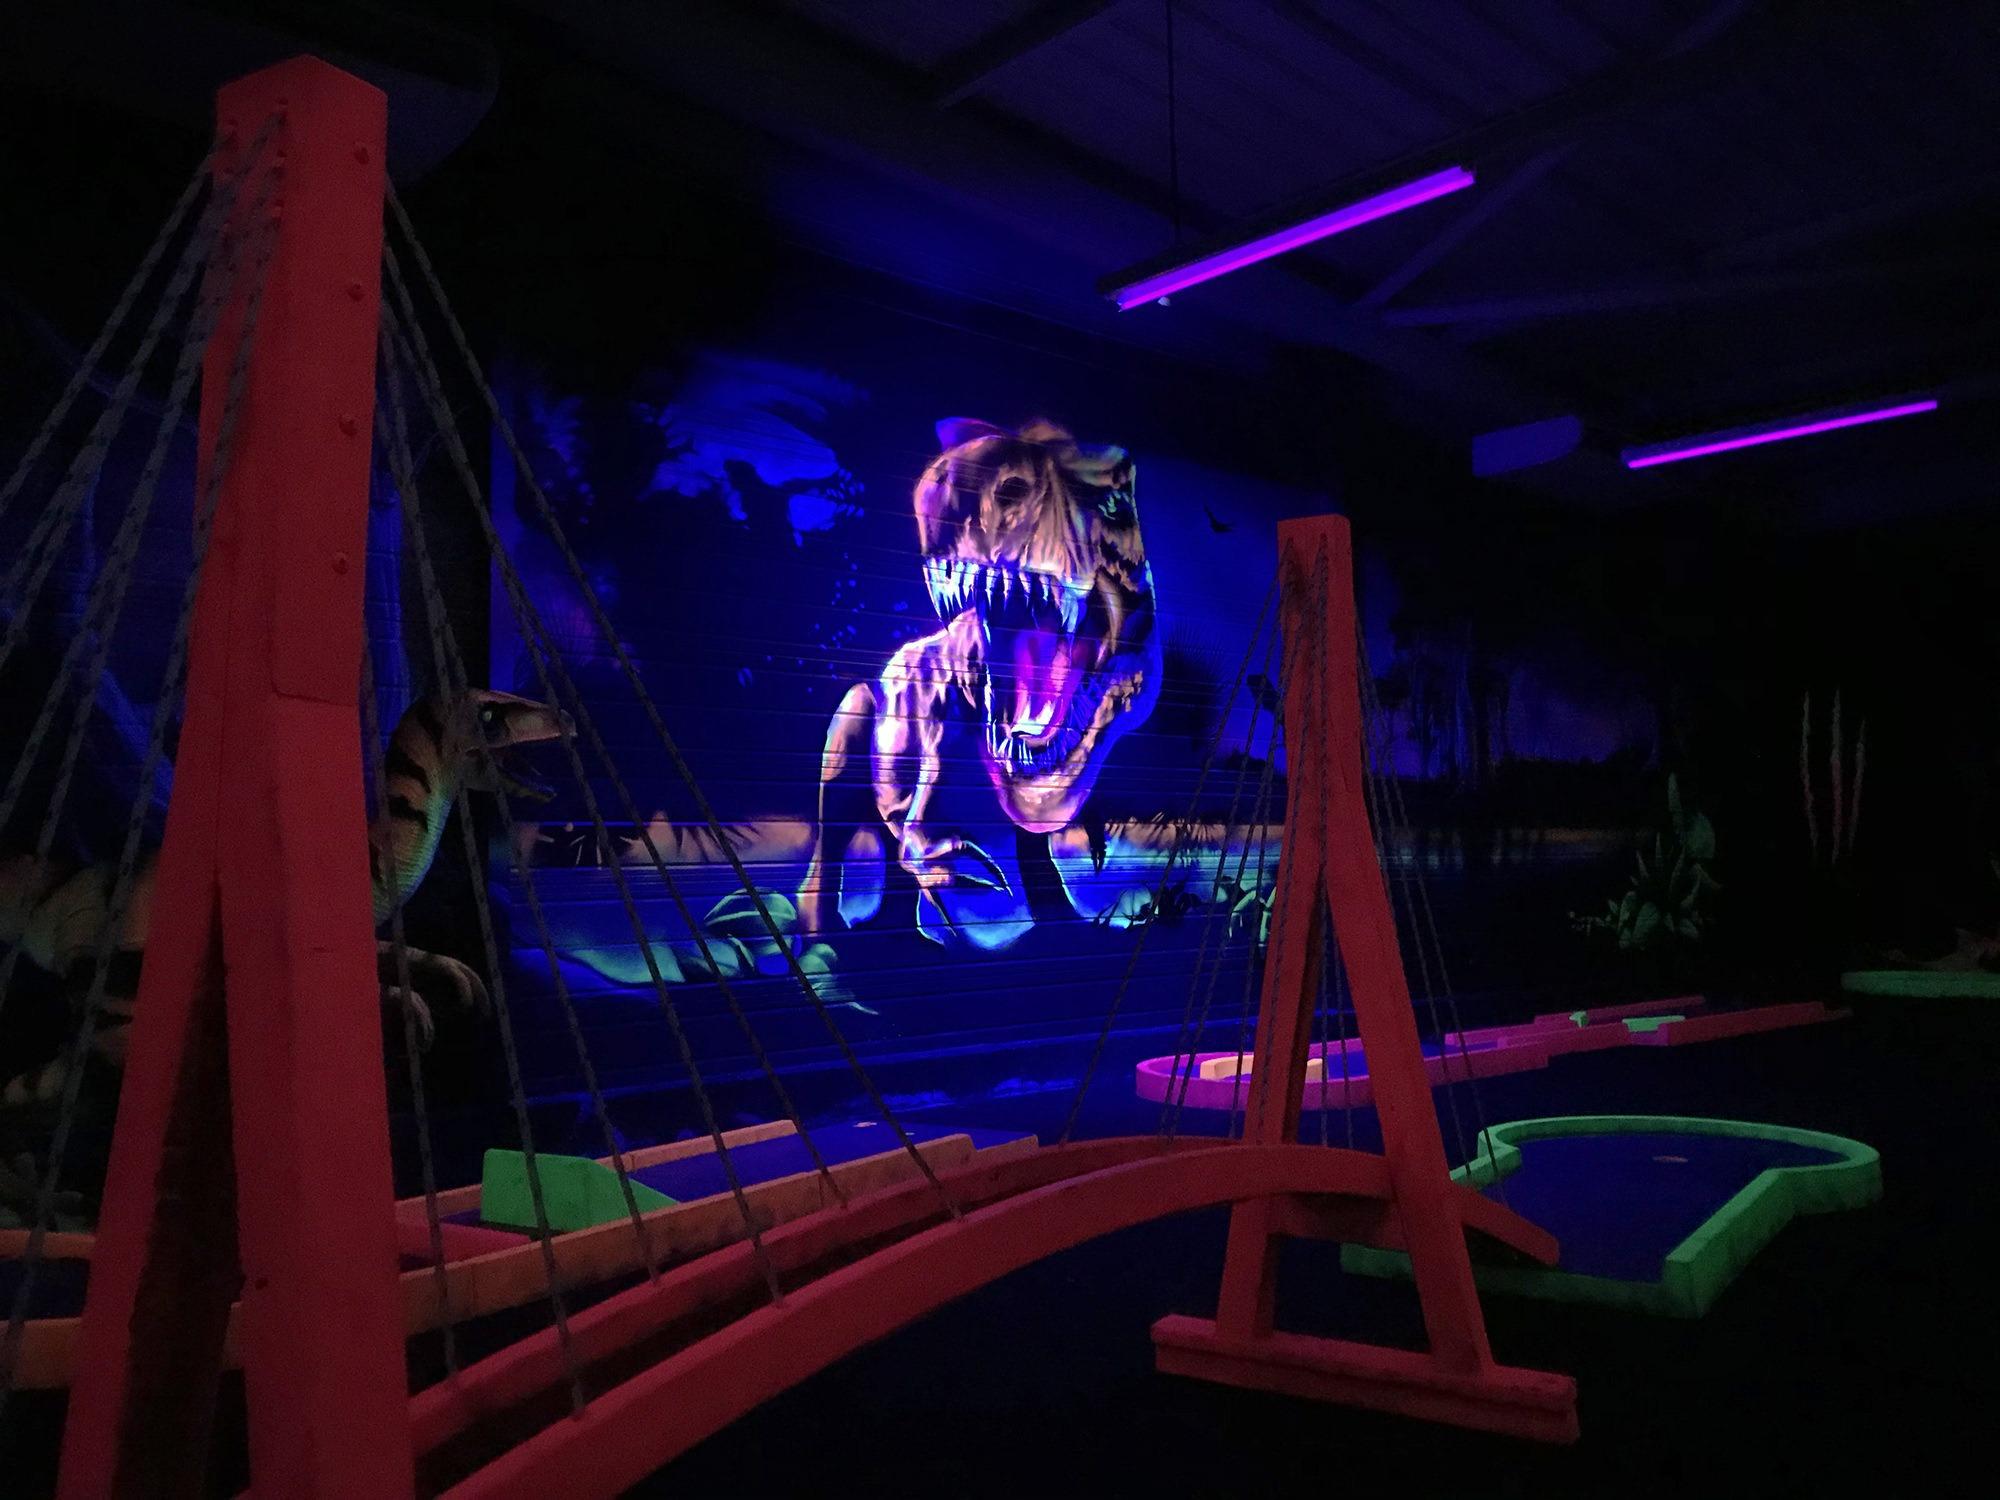 01-graffiti-laser-game-fresque-blacklight